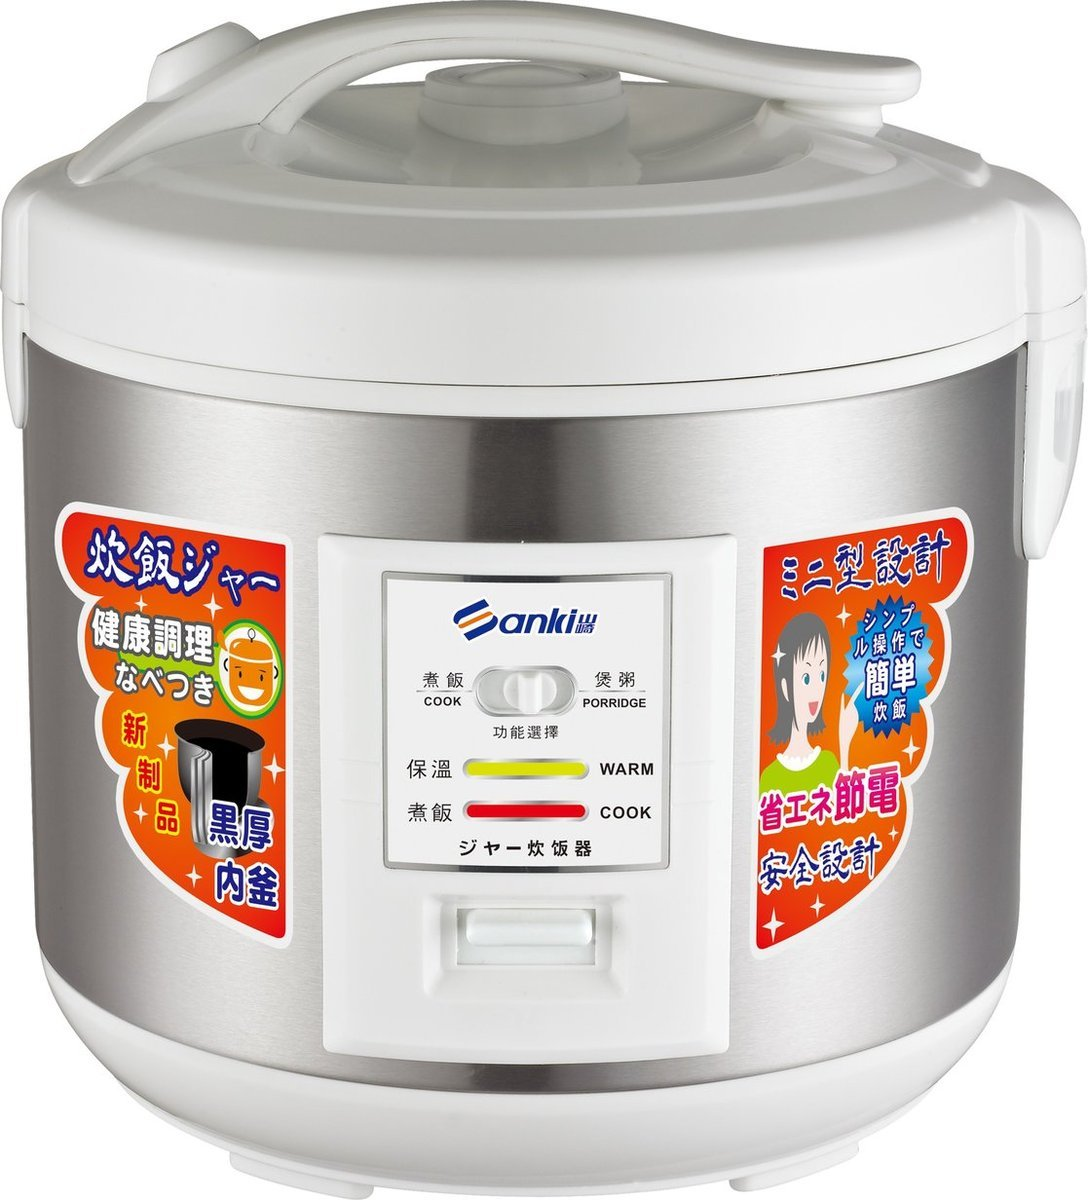 西施電飯煲 SK-R18